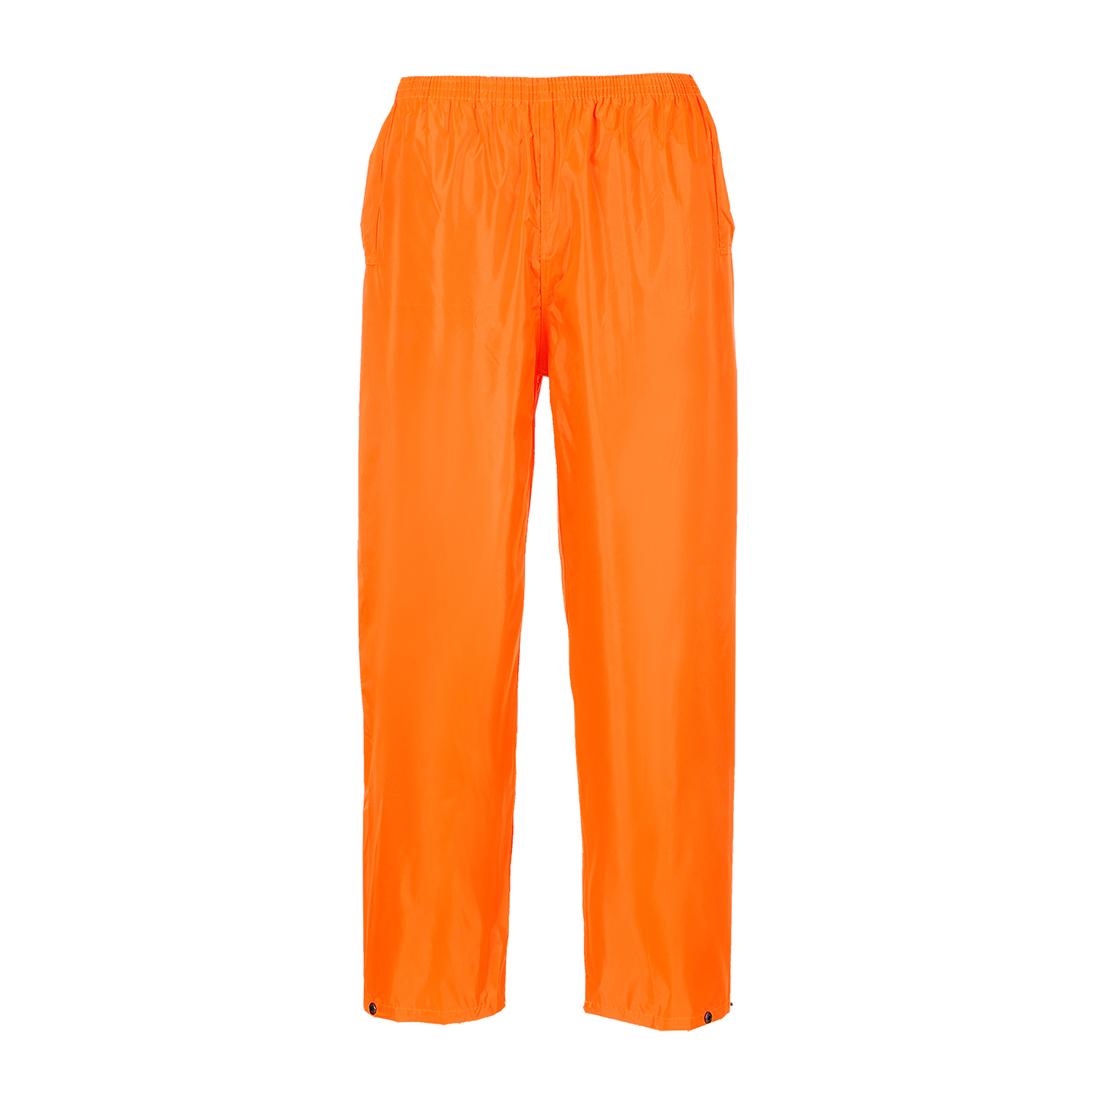 Rainwear, Pants